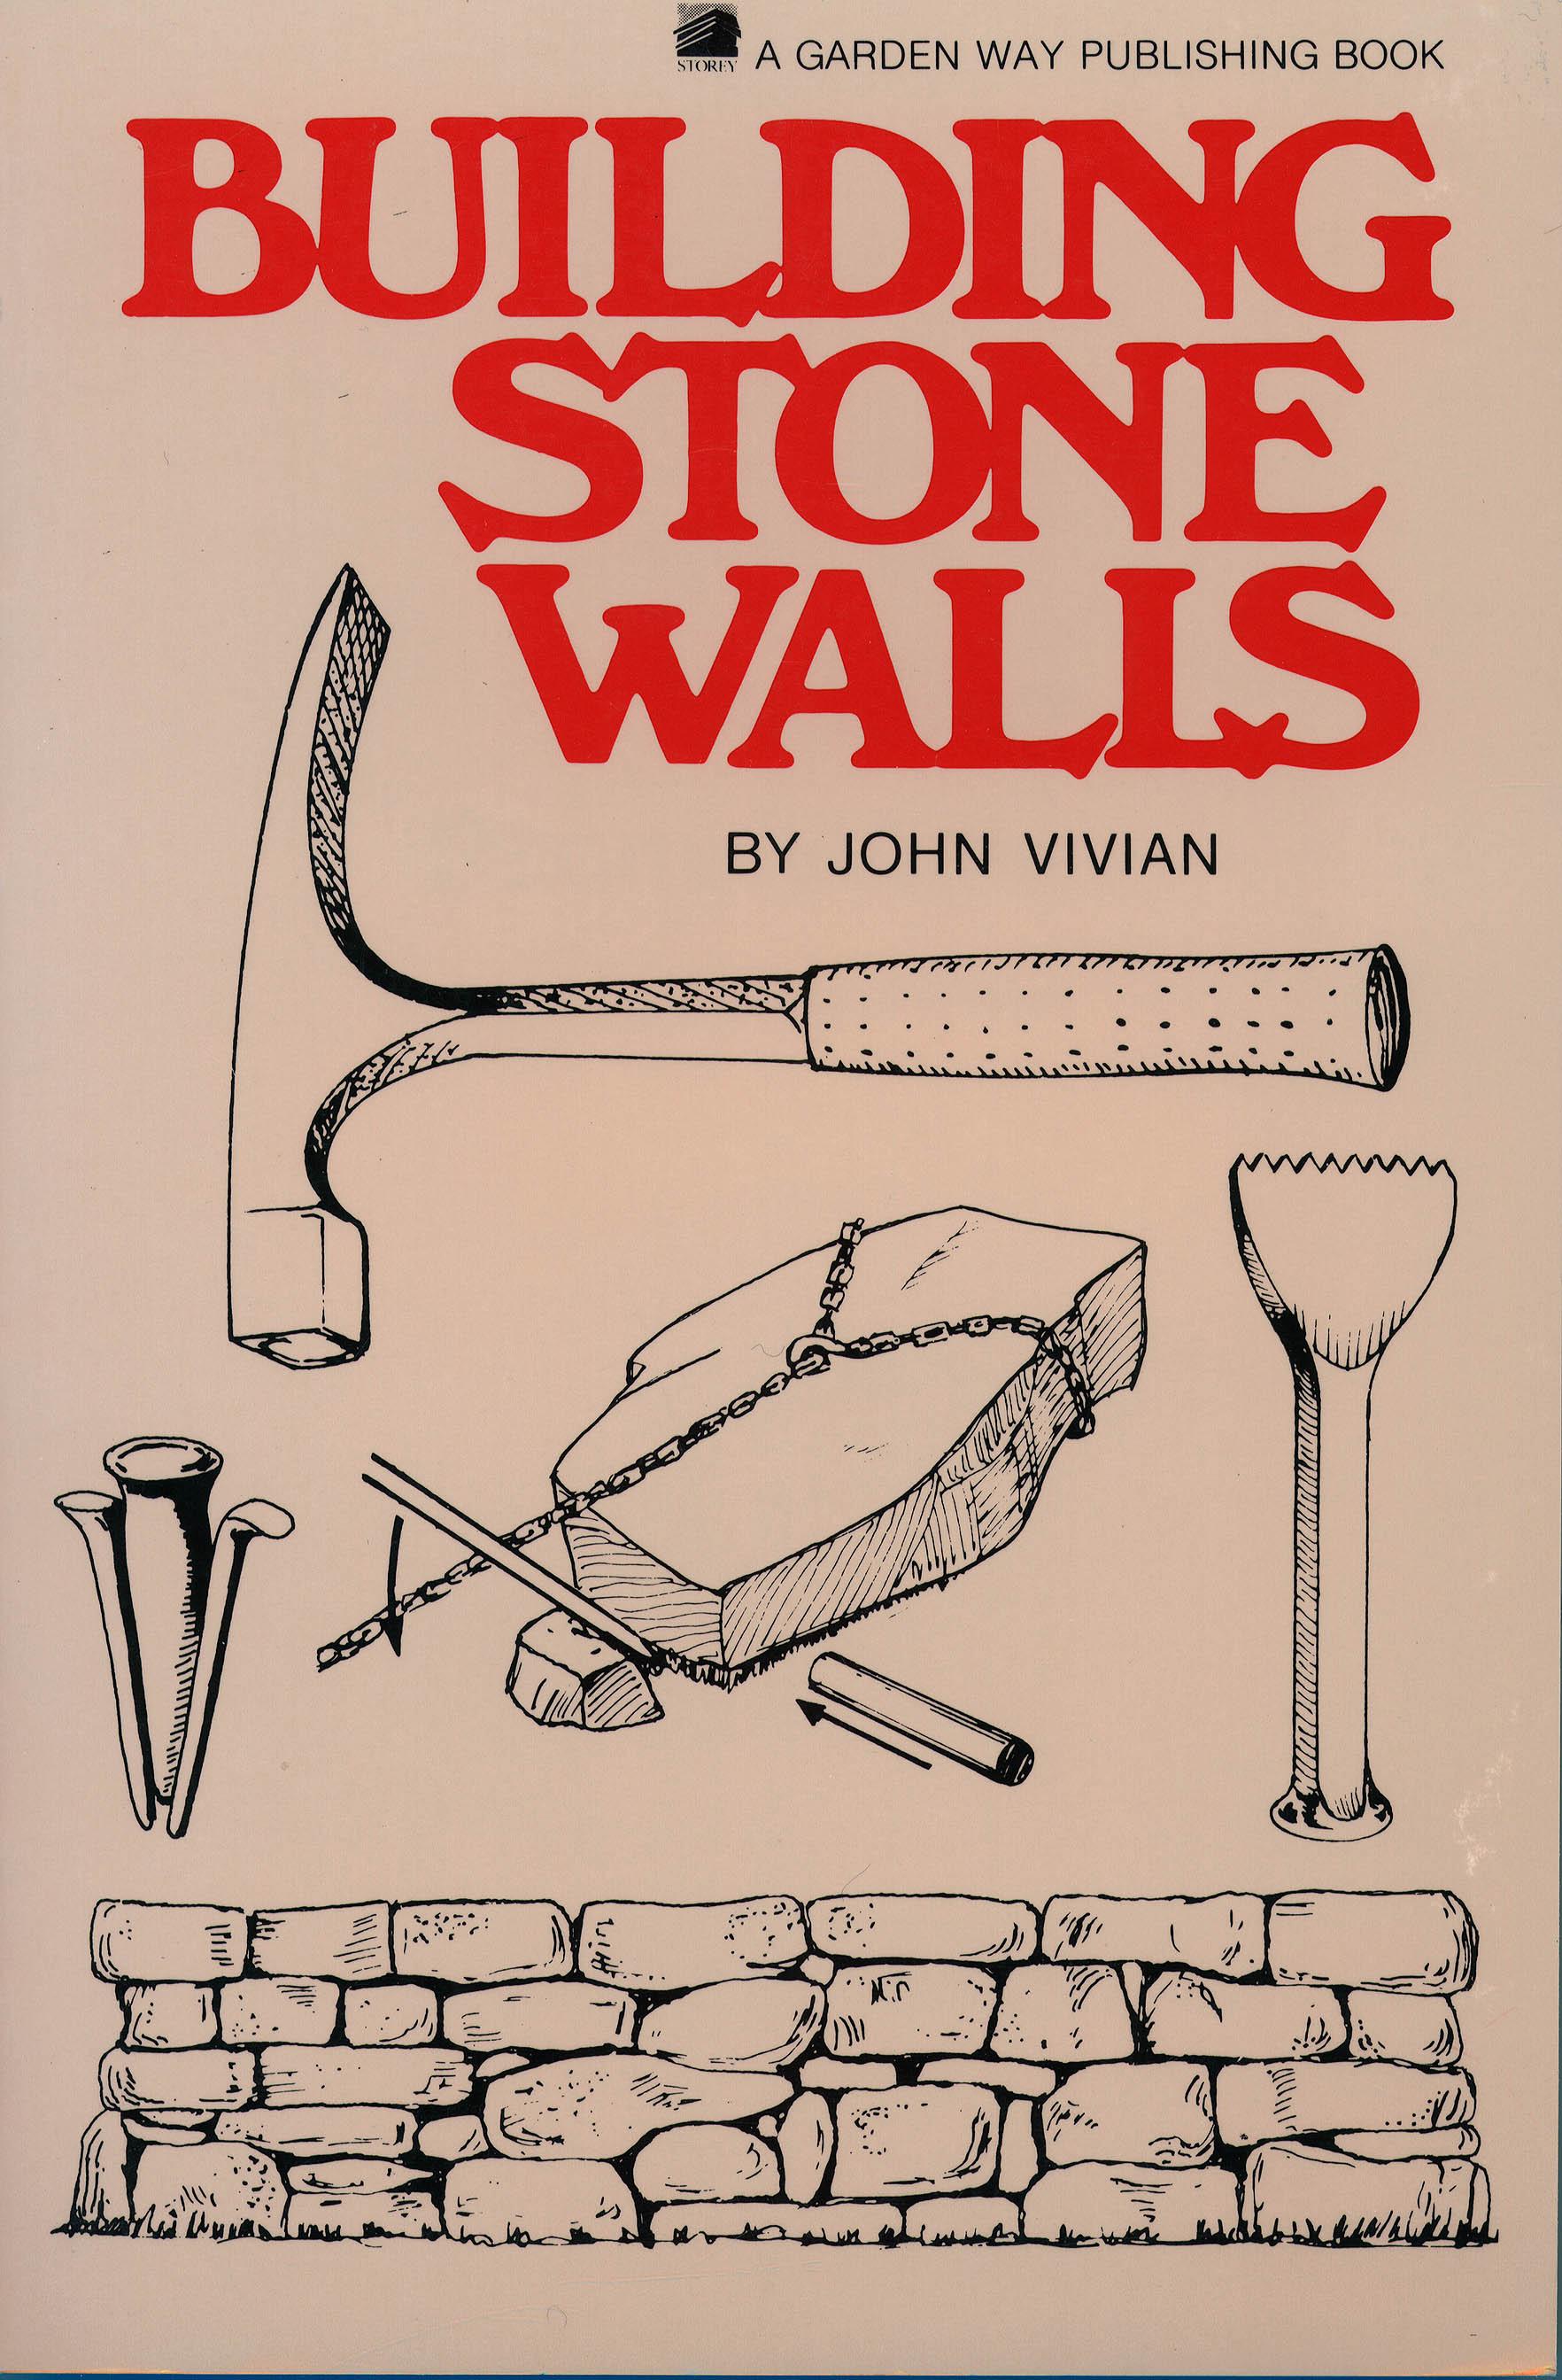 Building Stone Walls  - John Vivian